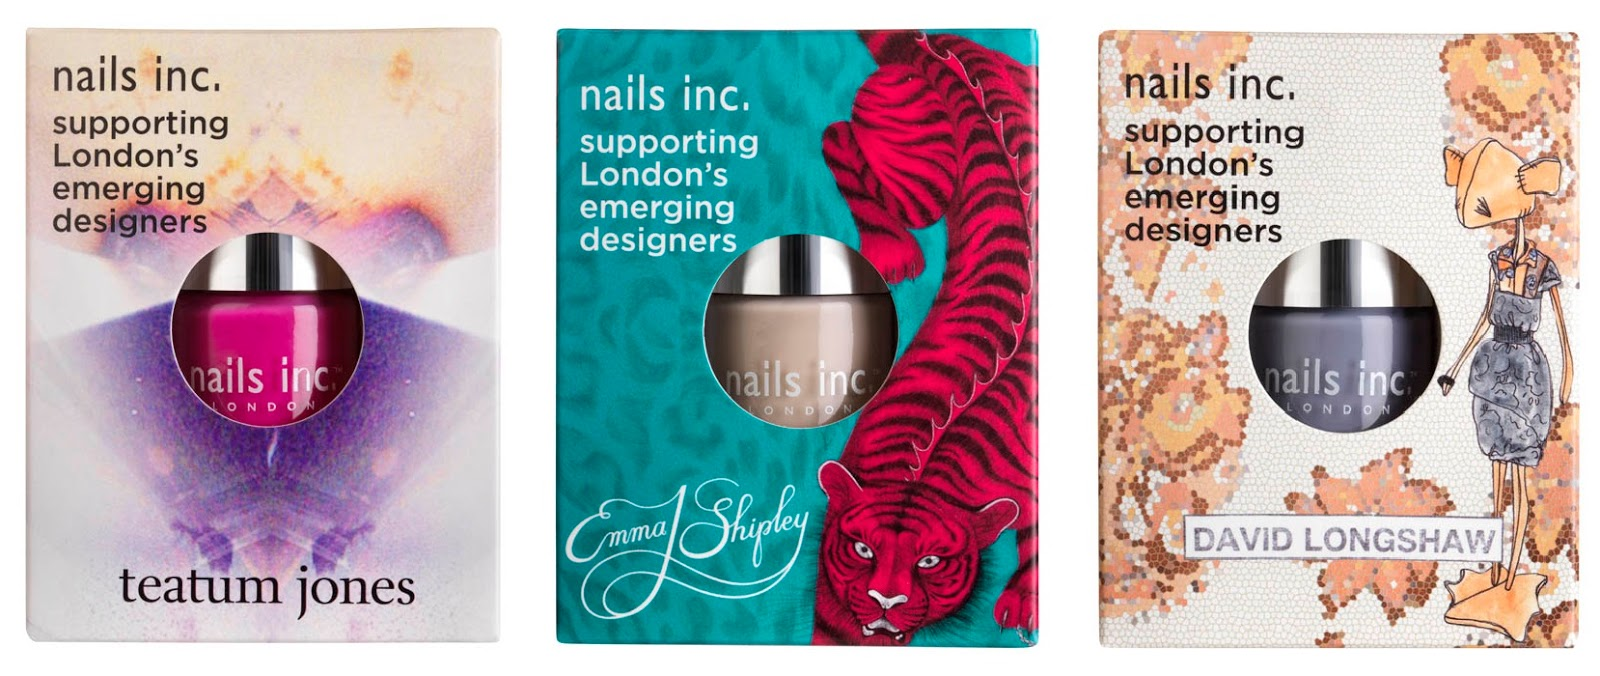 Nails Inc Emerging British Designer Collaboration